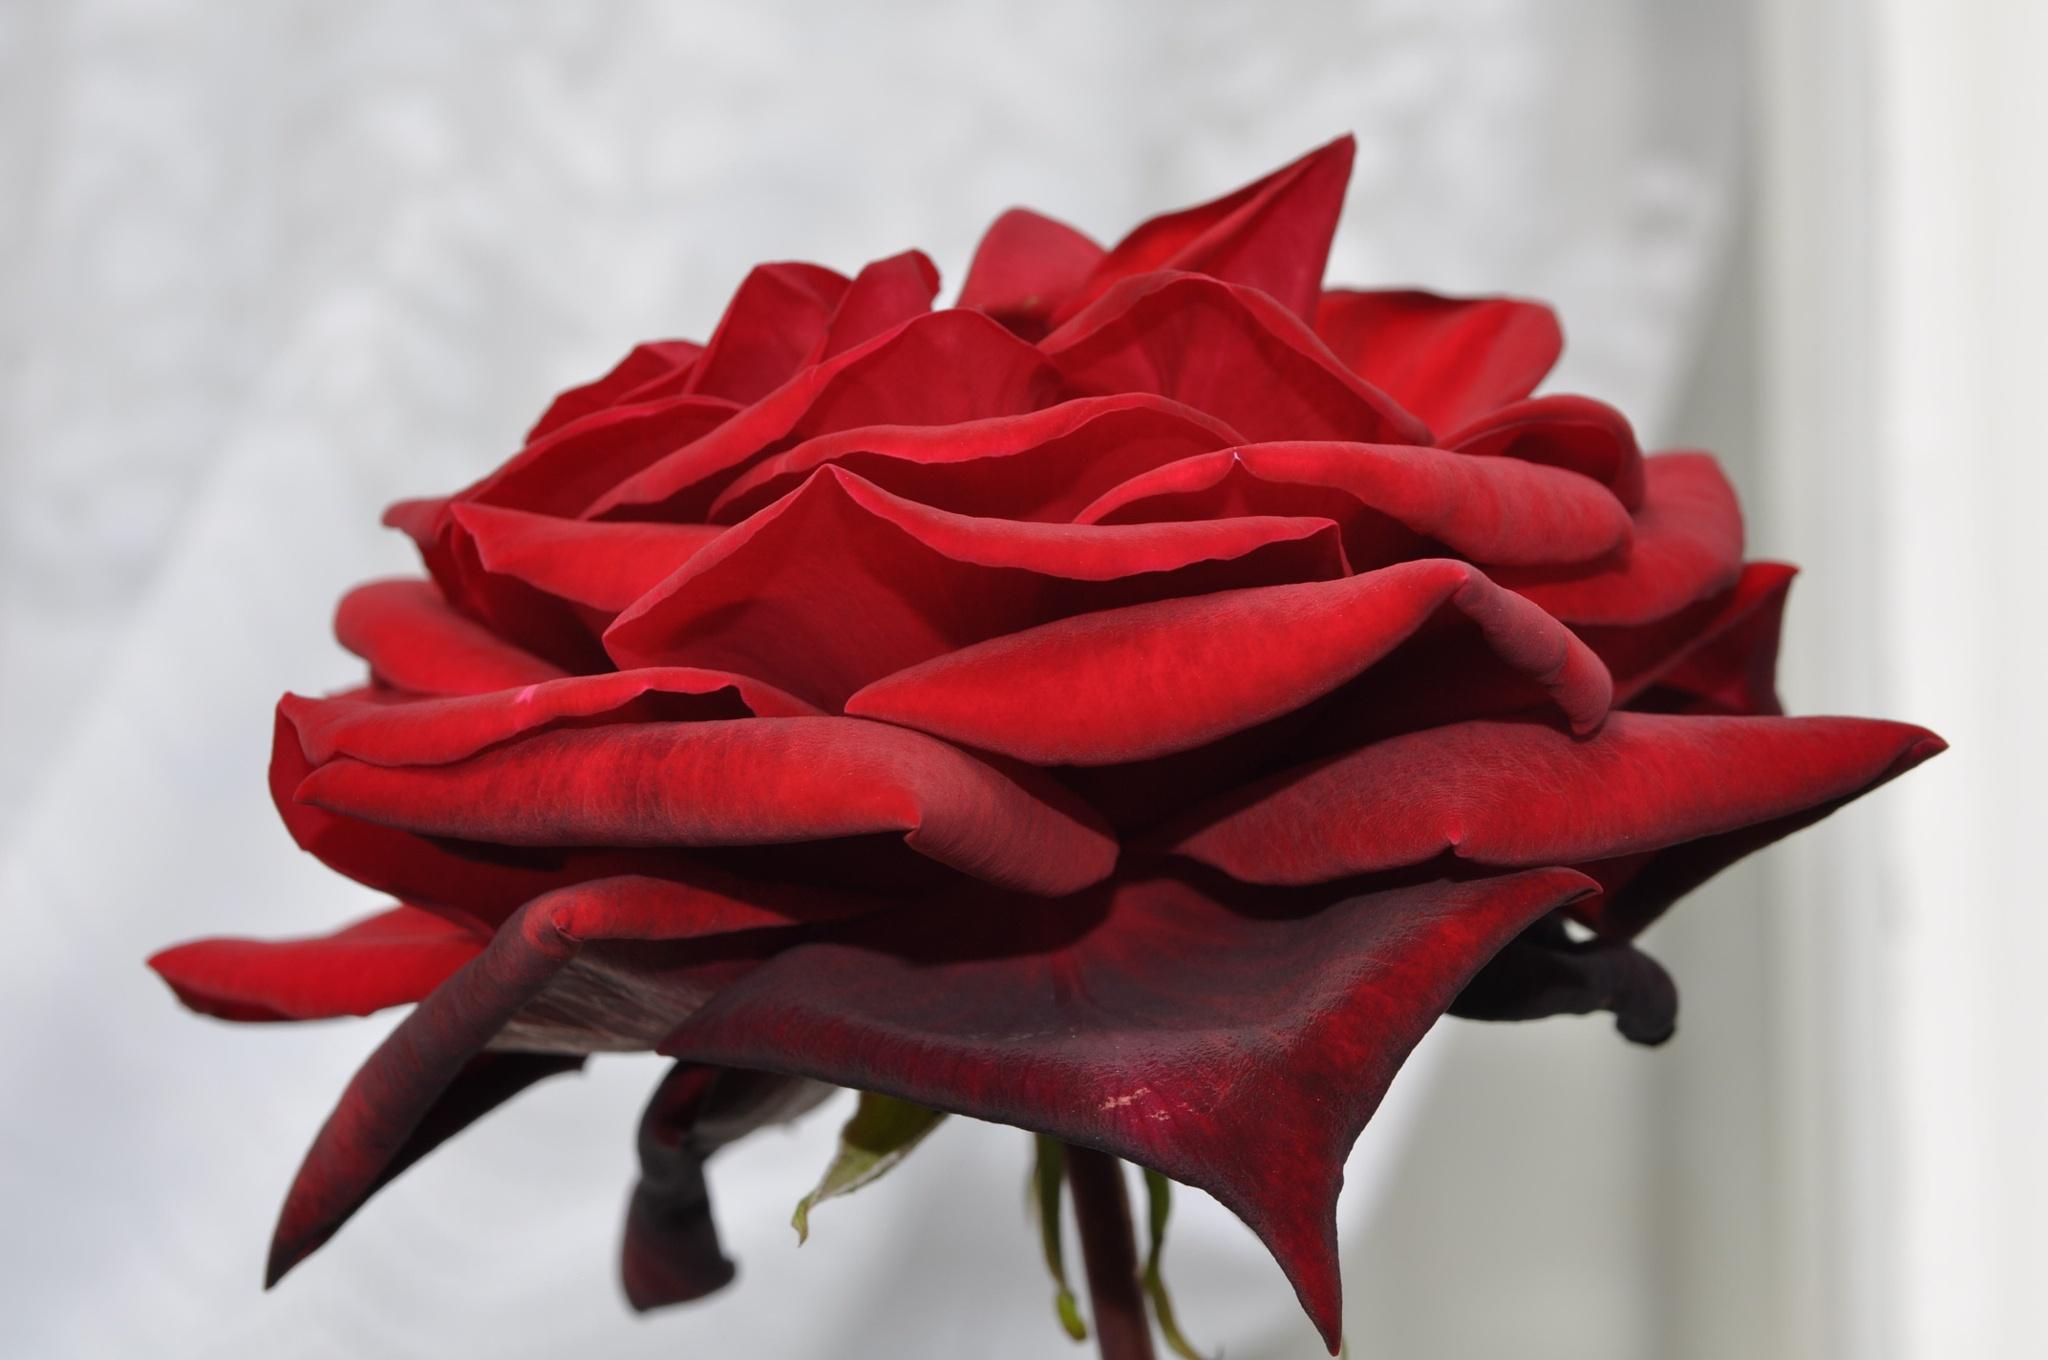 RED PETAL by Ellen Lauder